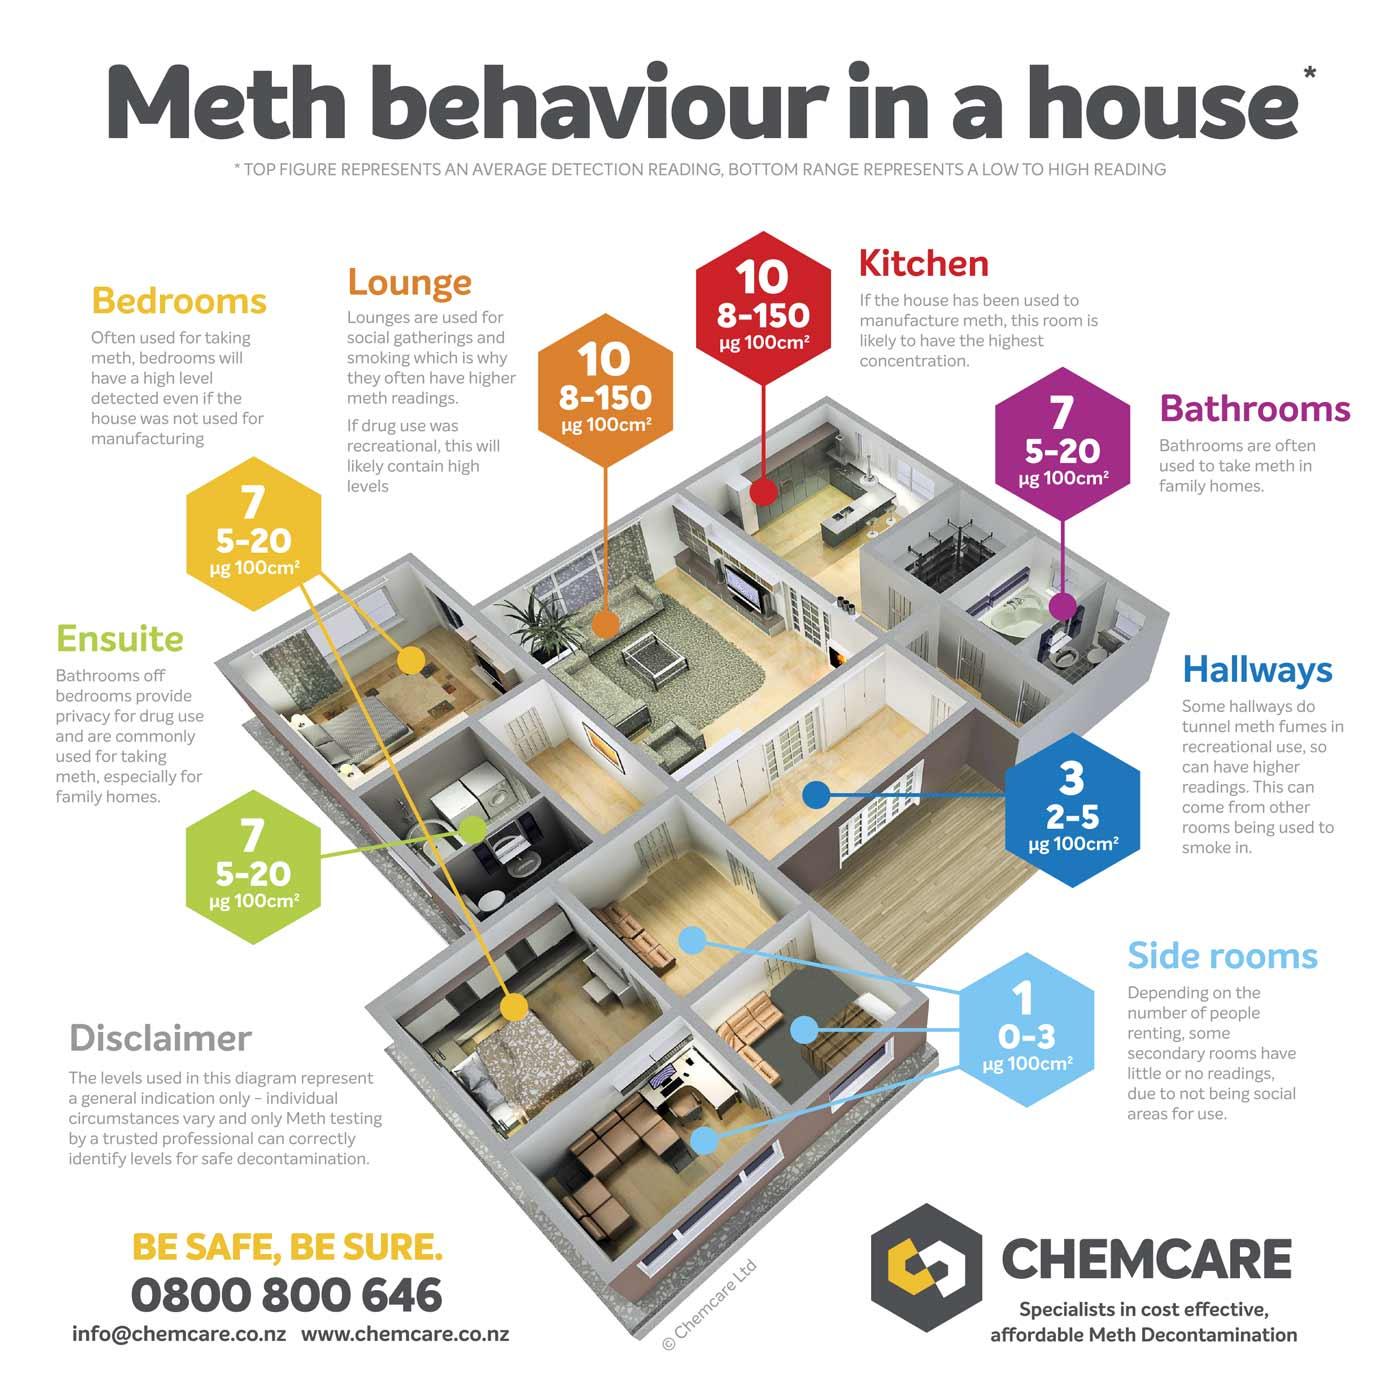 Meth-Behaviour-house.jpg